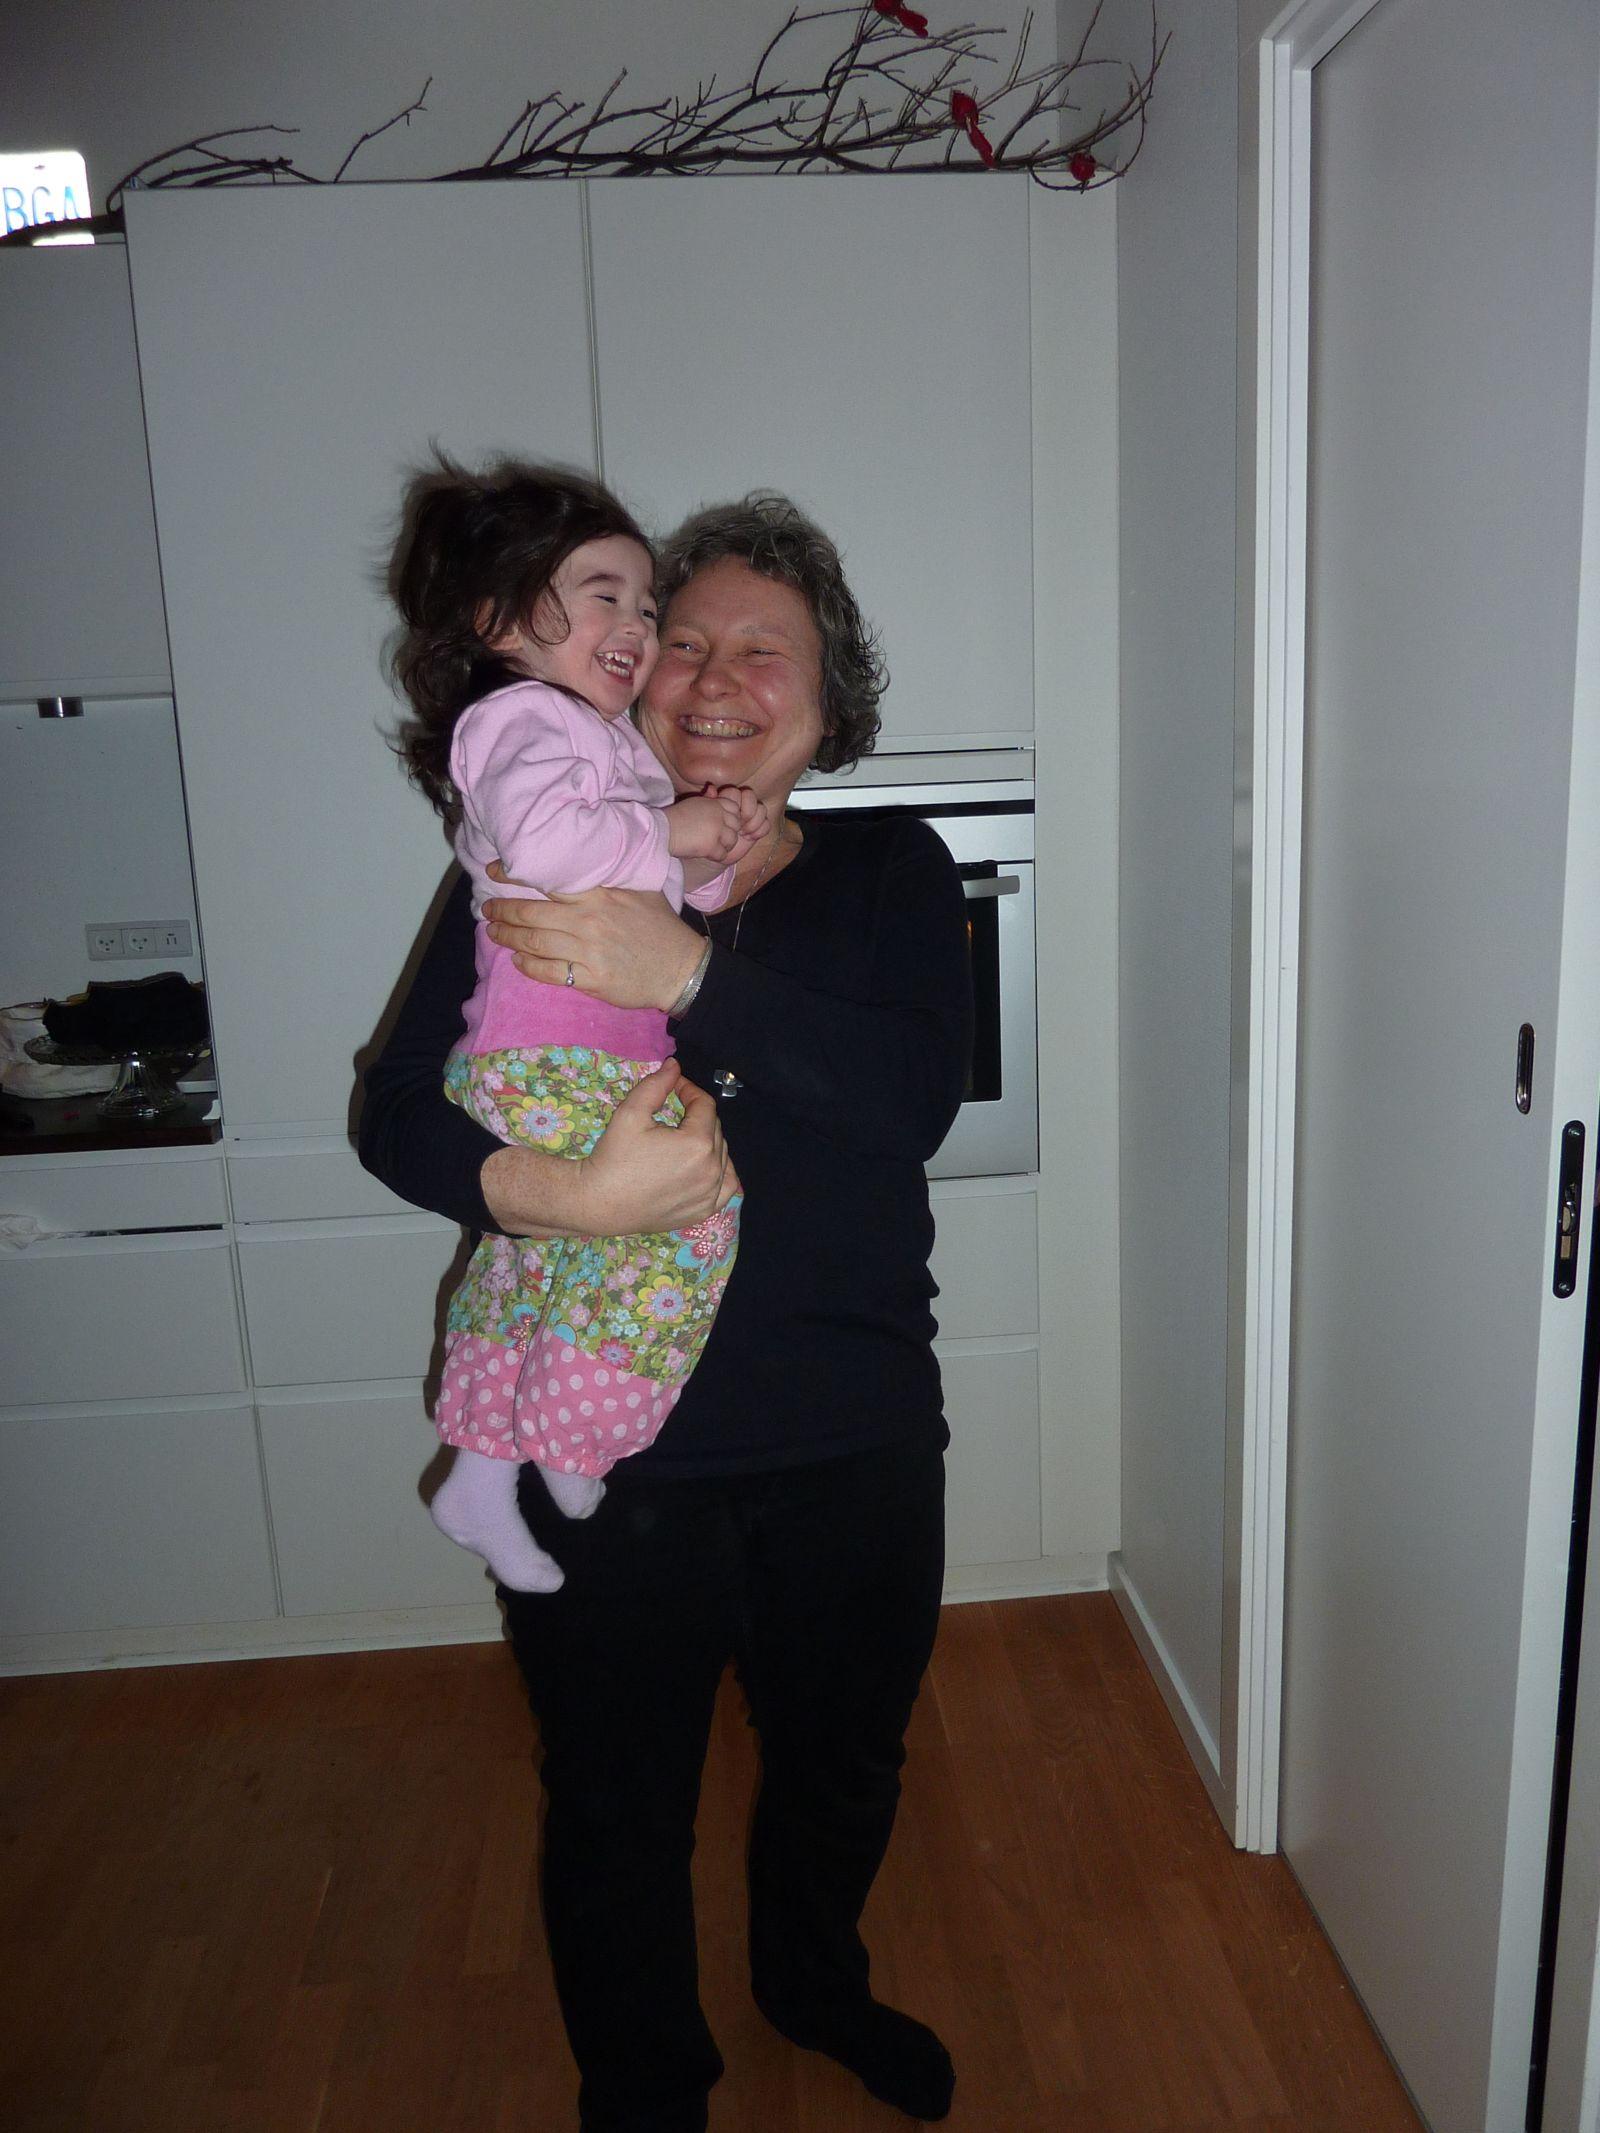 2010-11-26-1835_-_Bedste_1; Mette Labansen; Qupanuk Eugenius Labansen